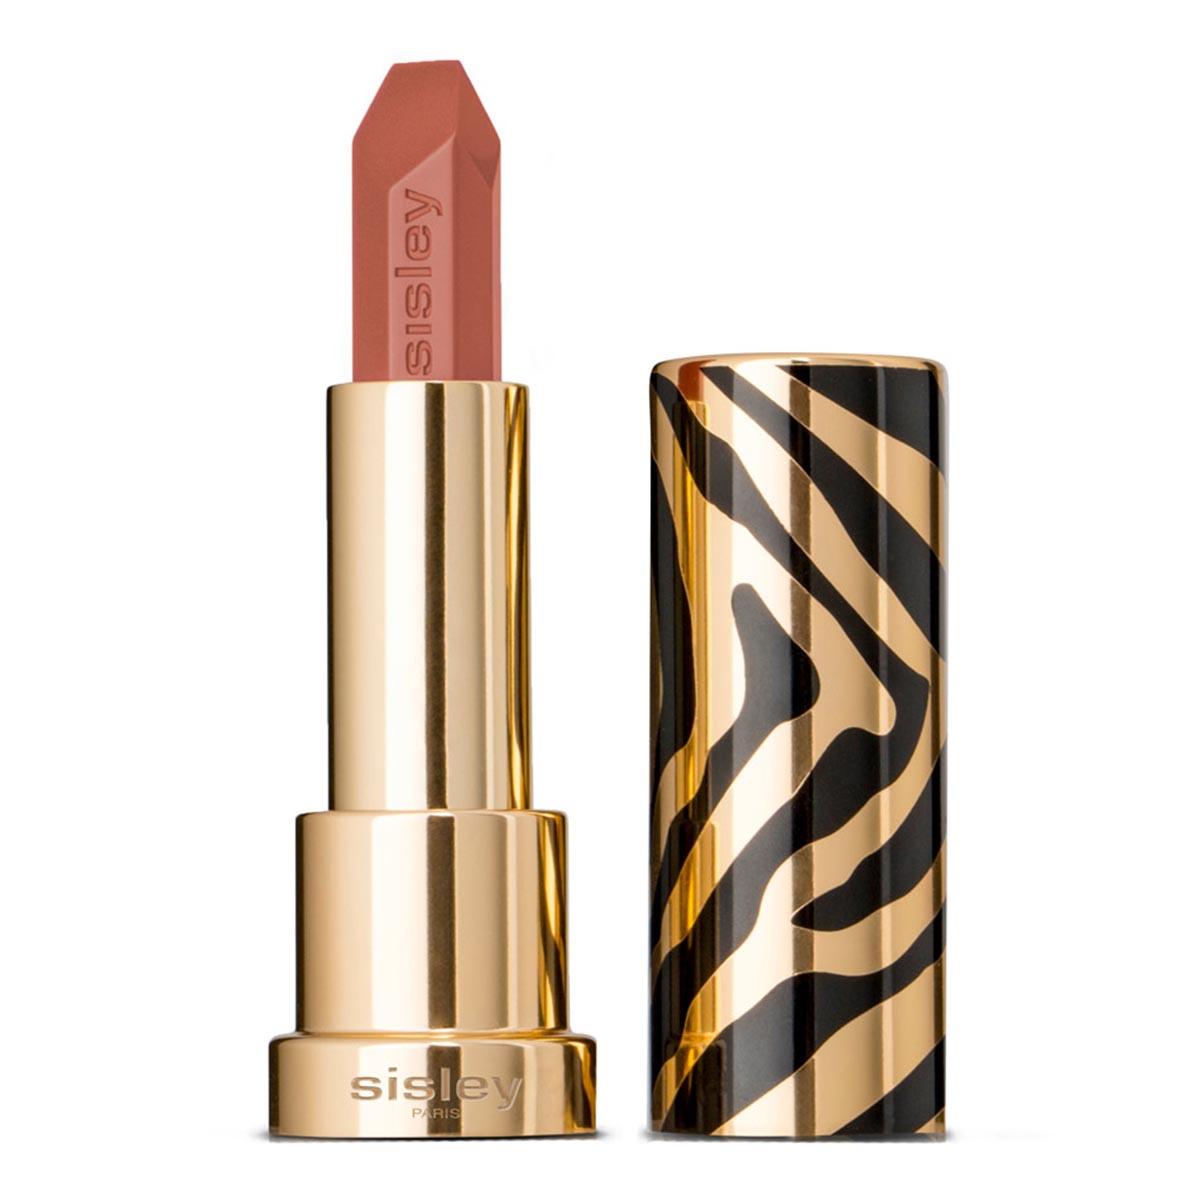 Sisley le phyto rouge long lasting hydration lipstick 12 beige bali